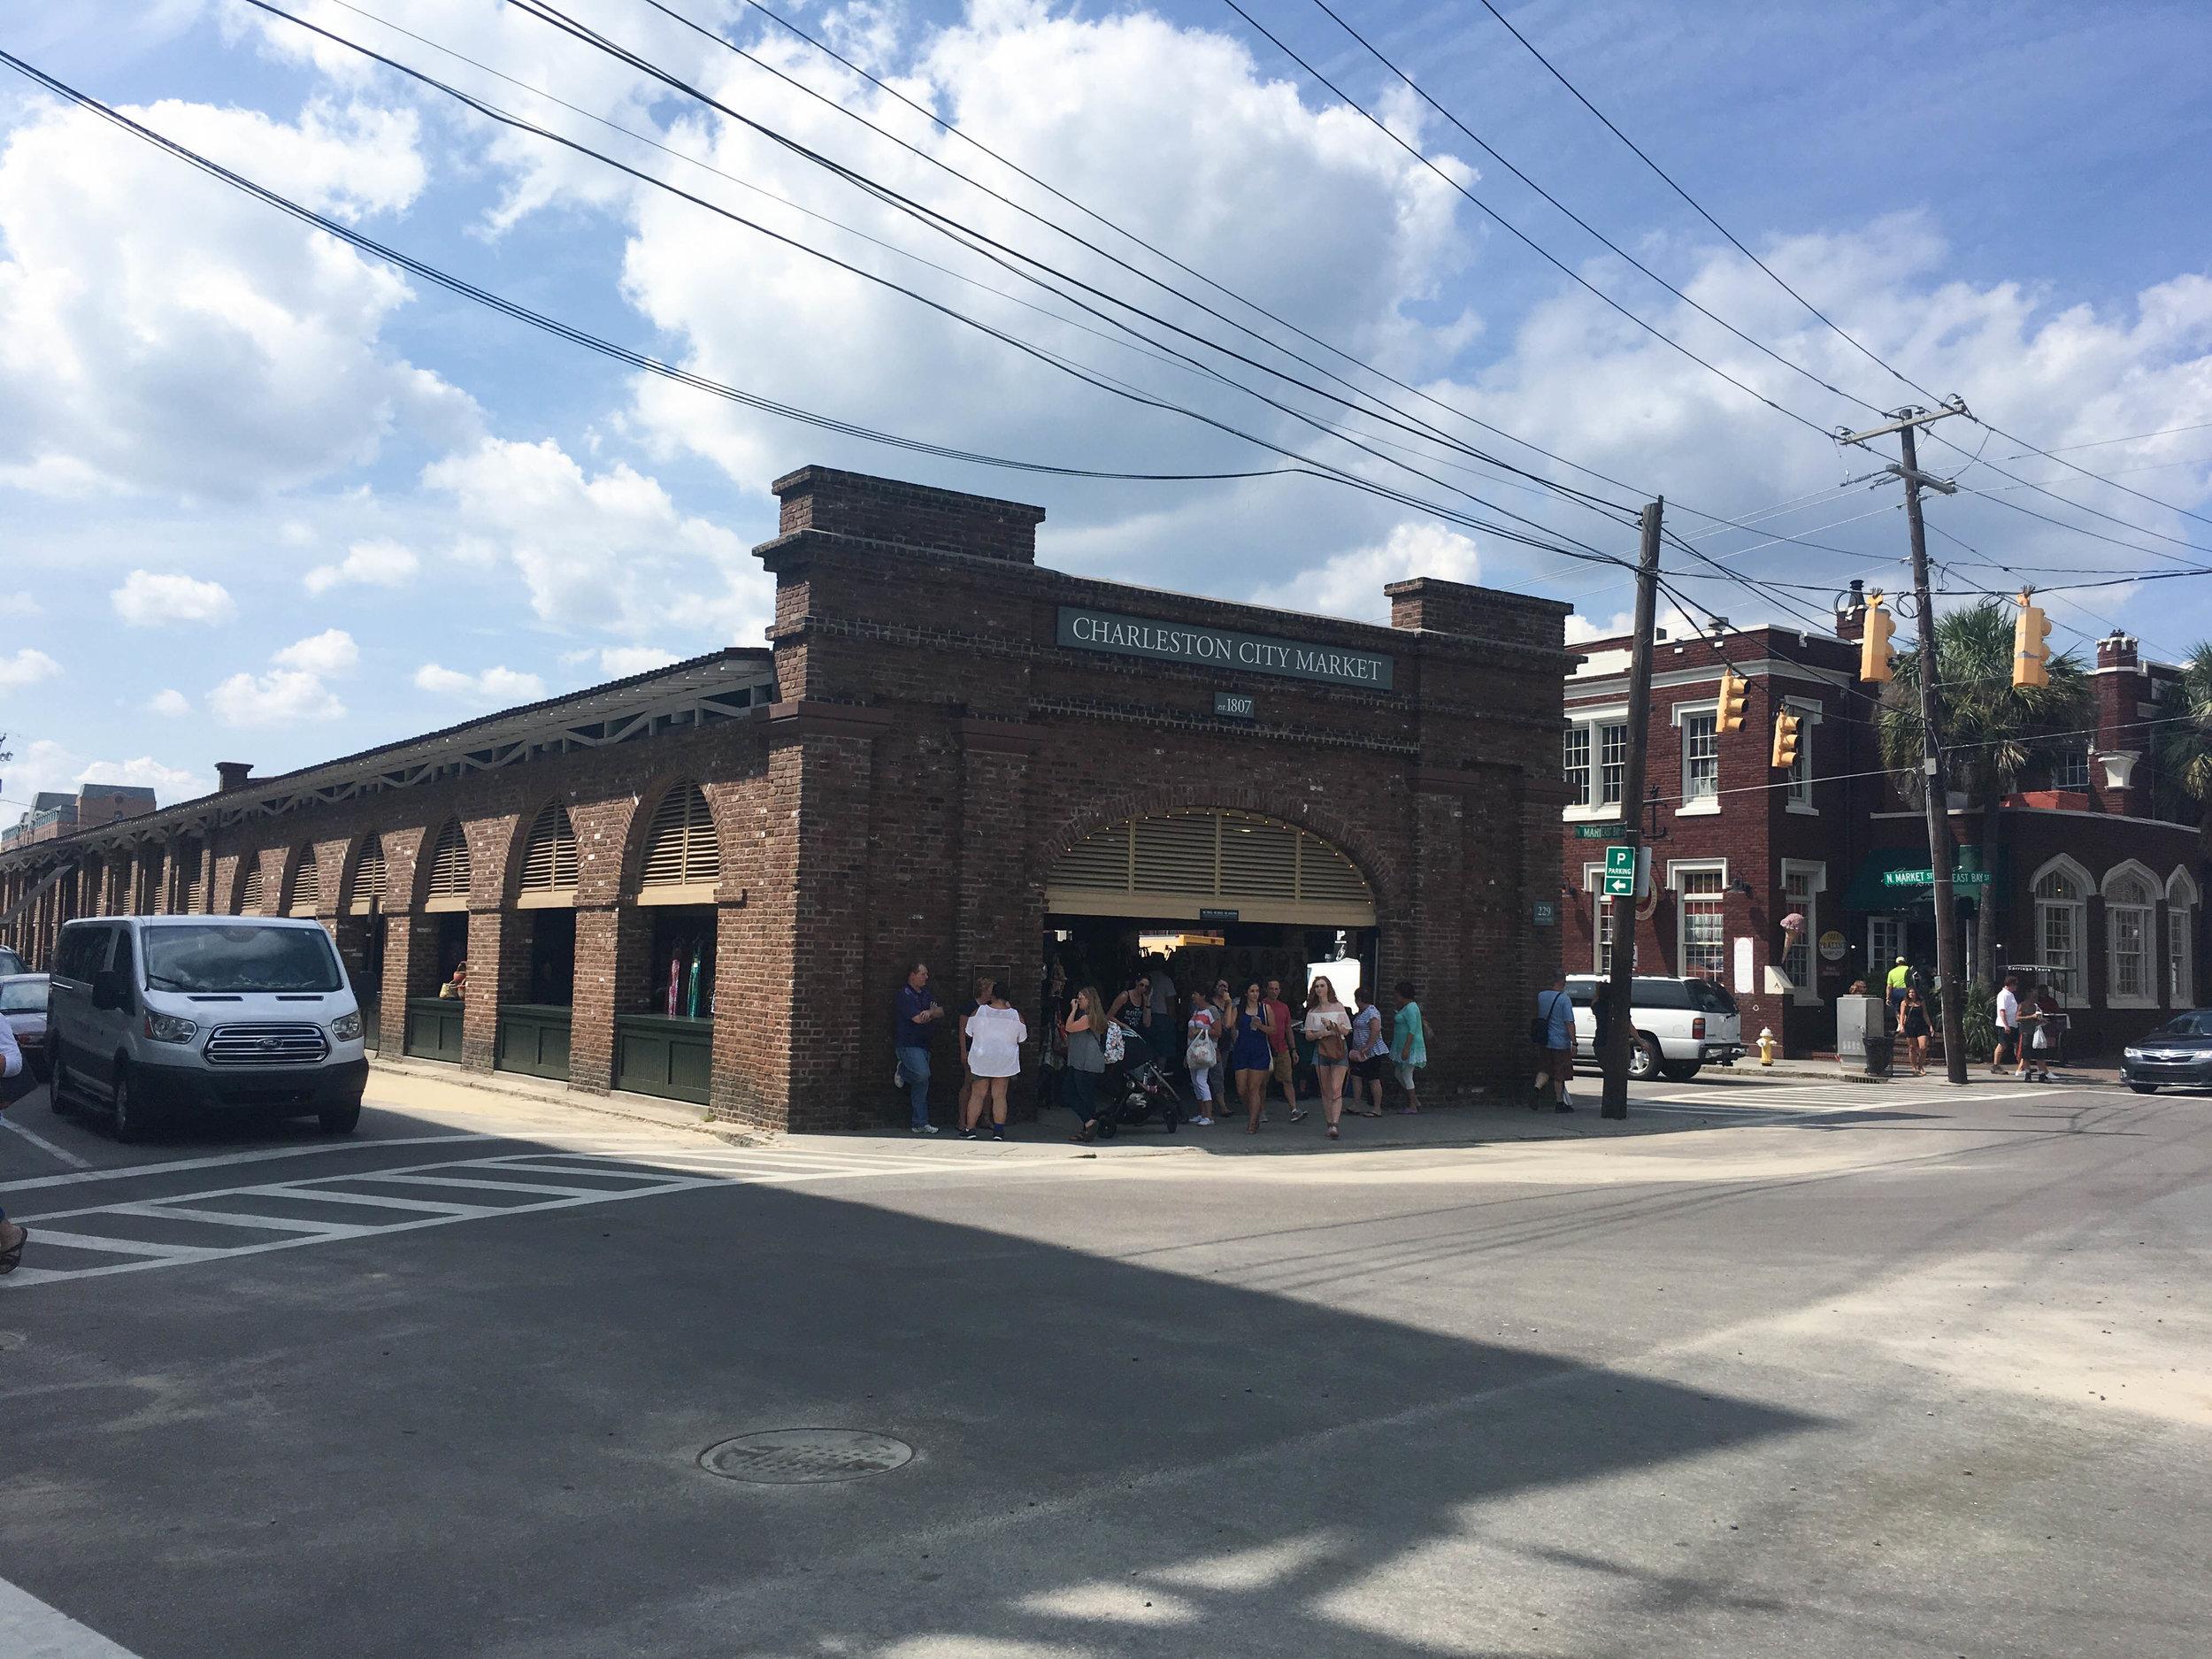 Charleston City Market.jpg